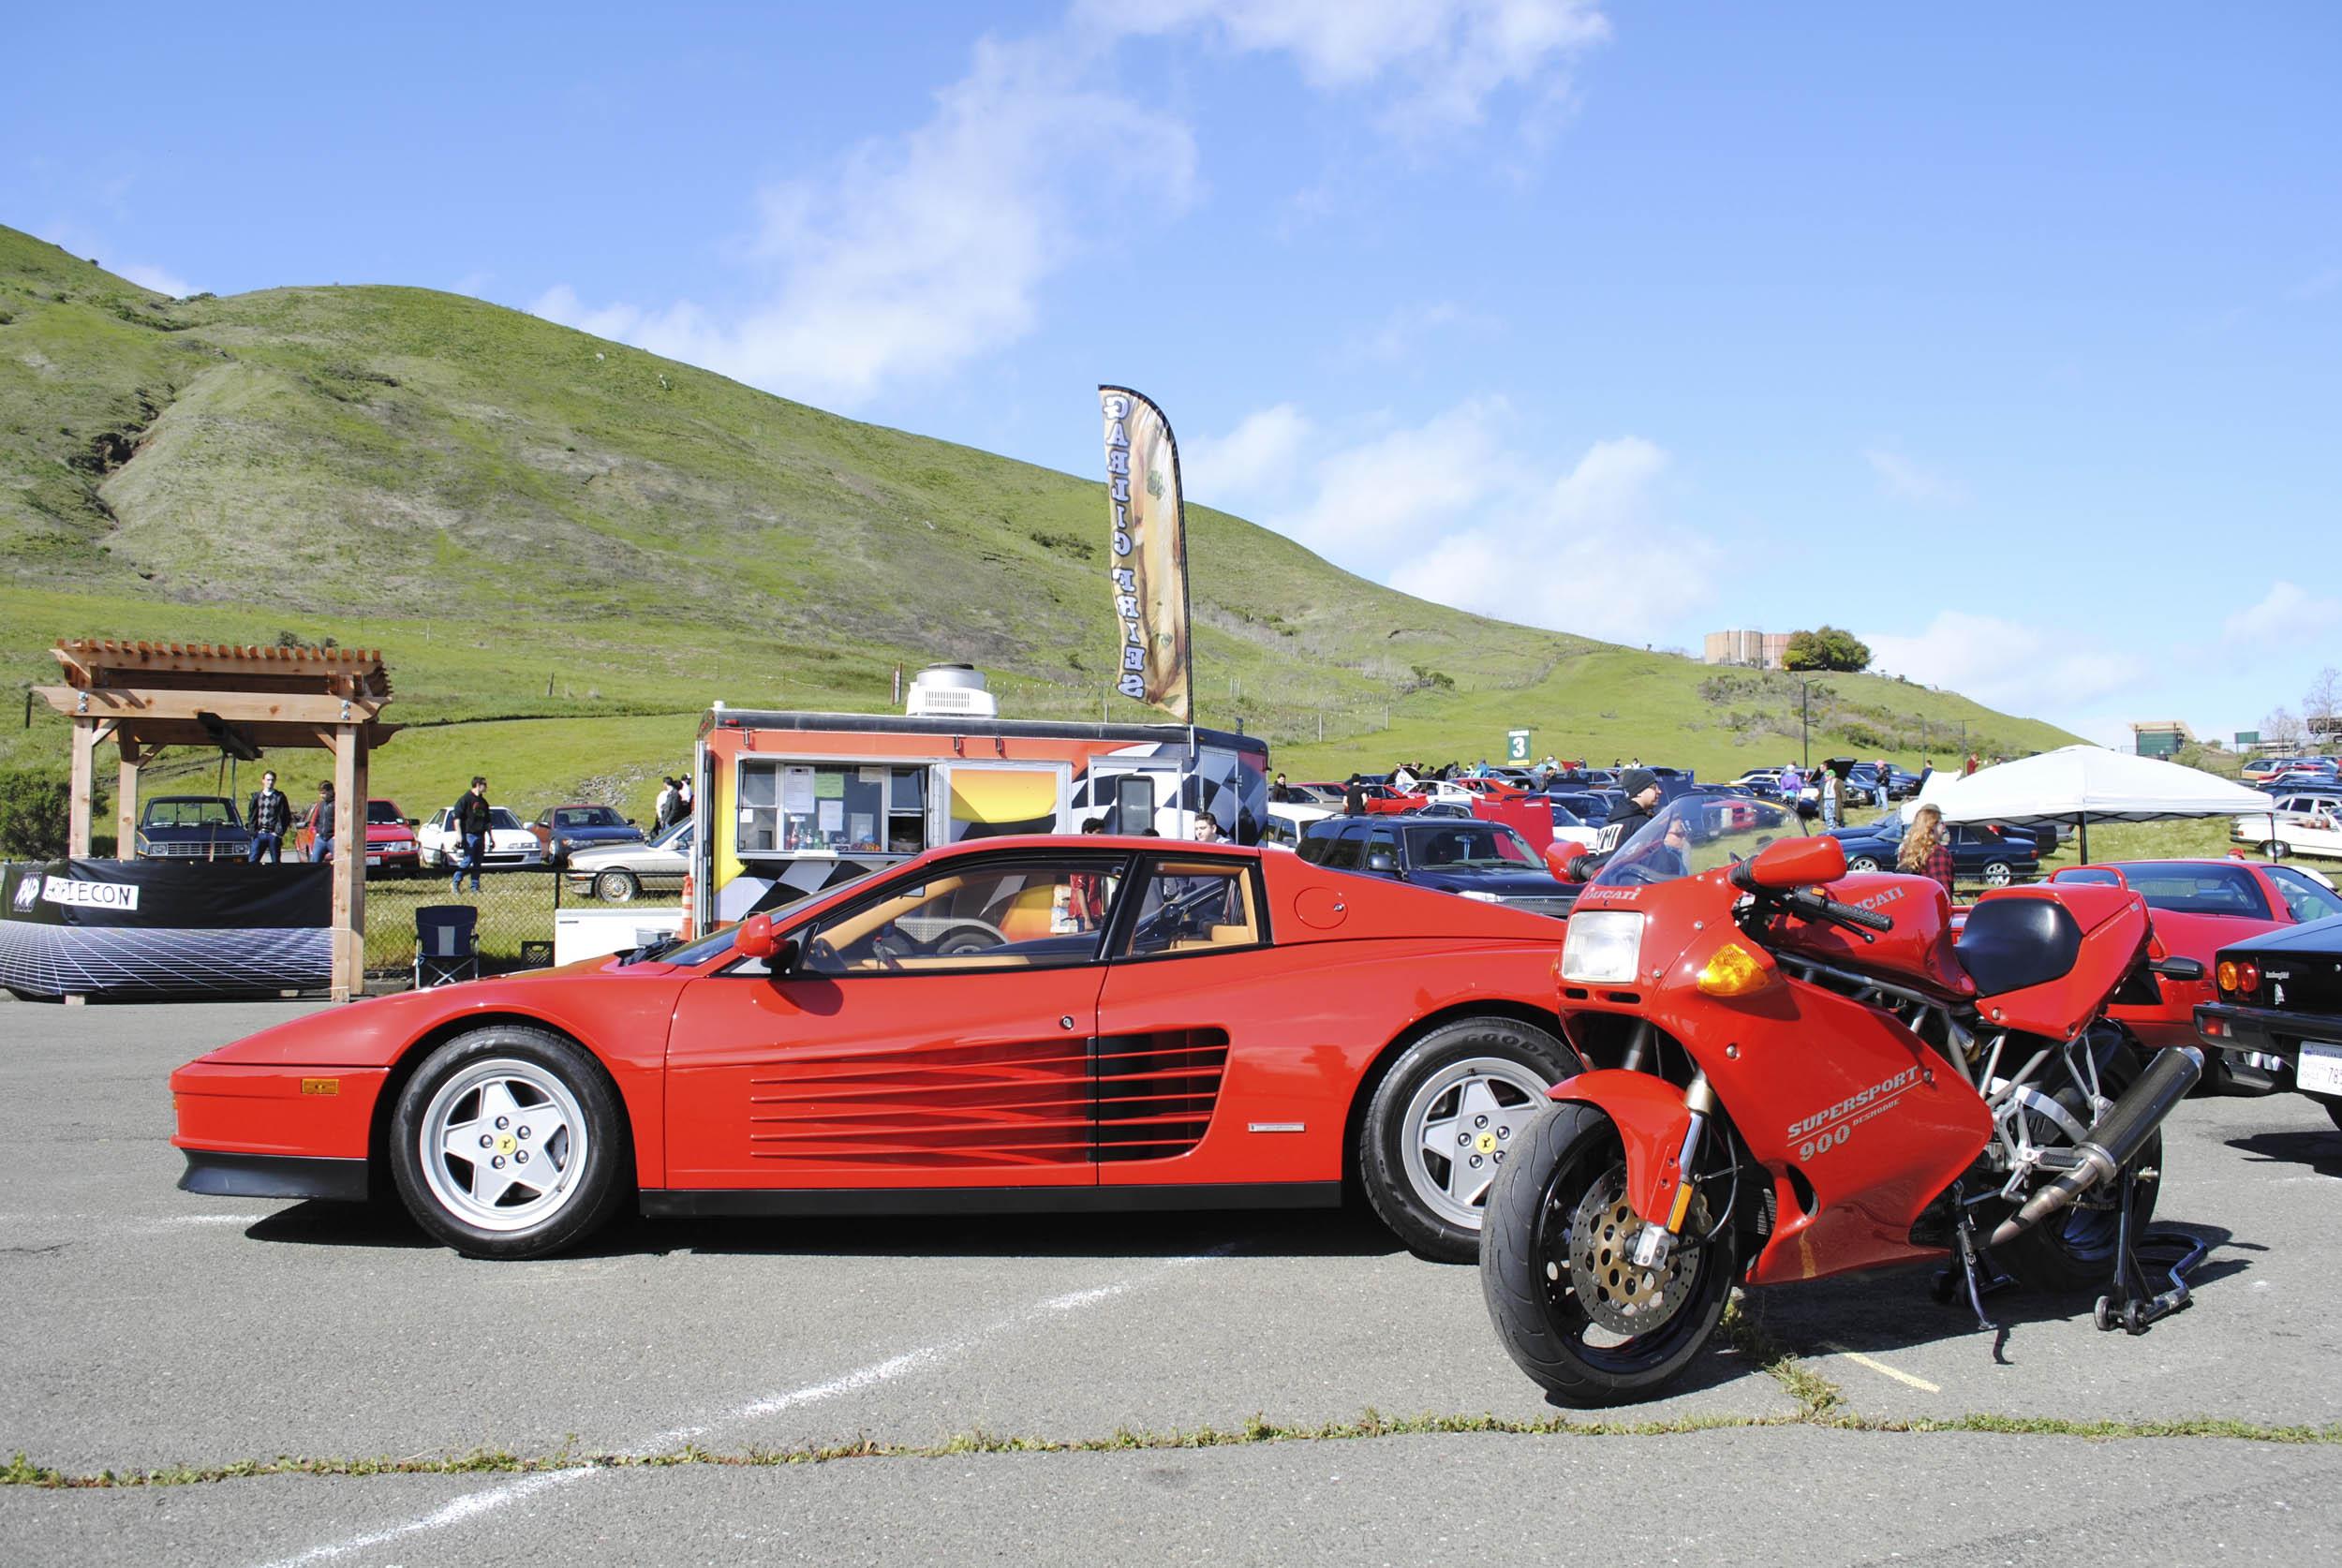 Radwood Ferrari Testarossa and Ducati 900